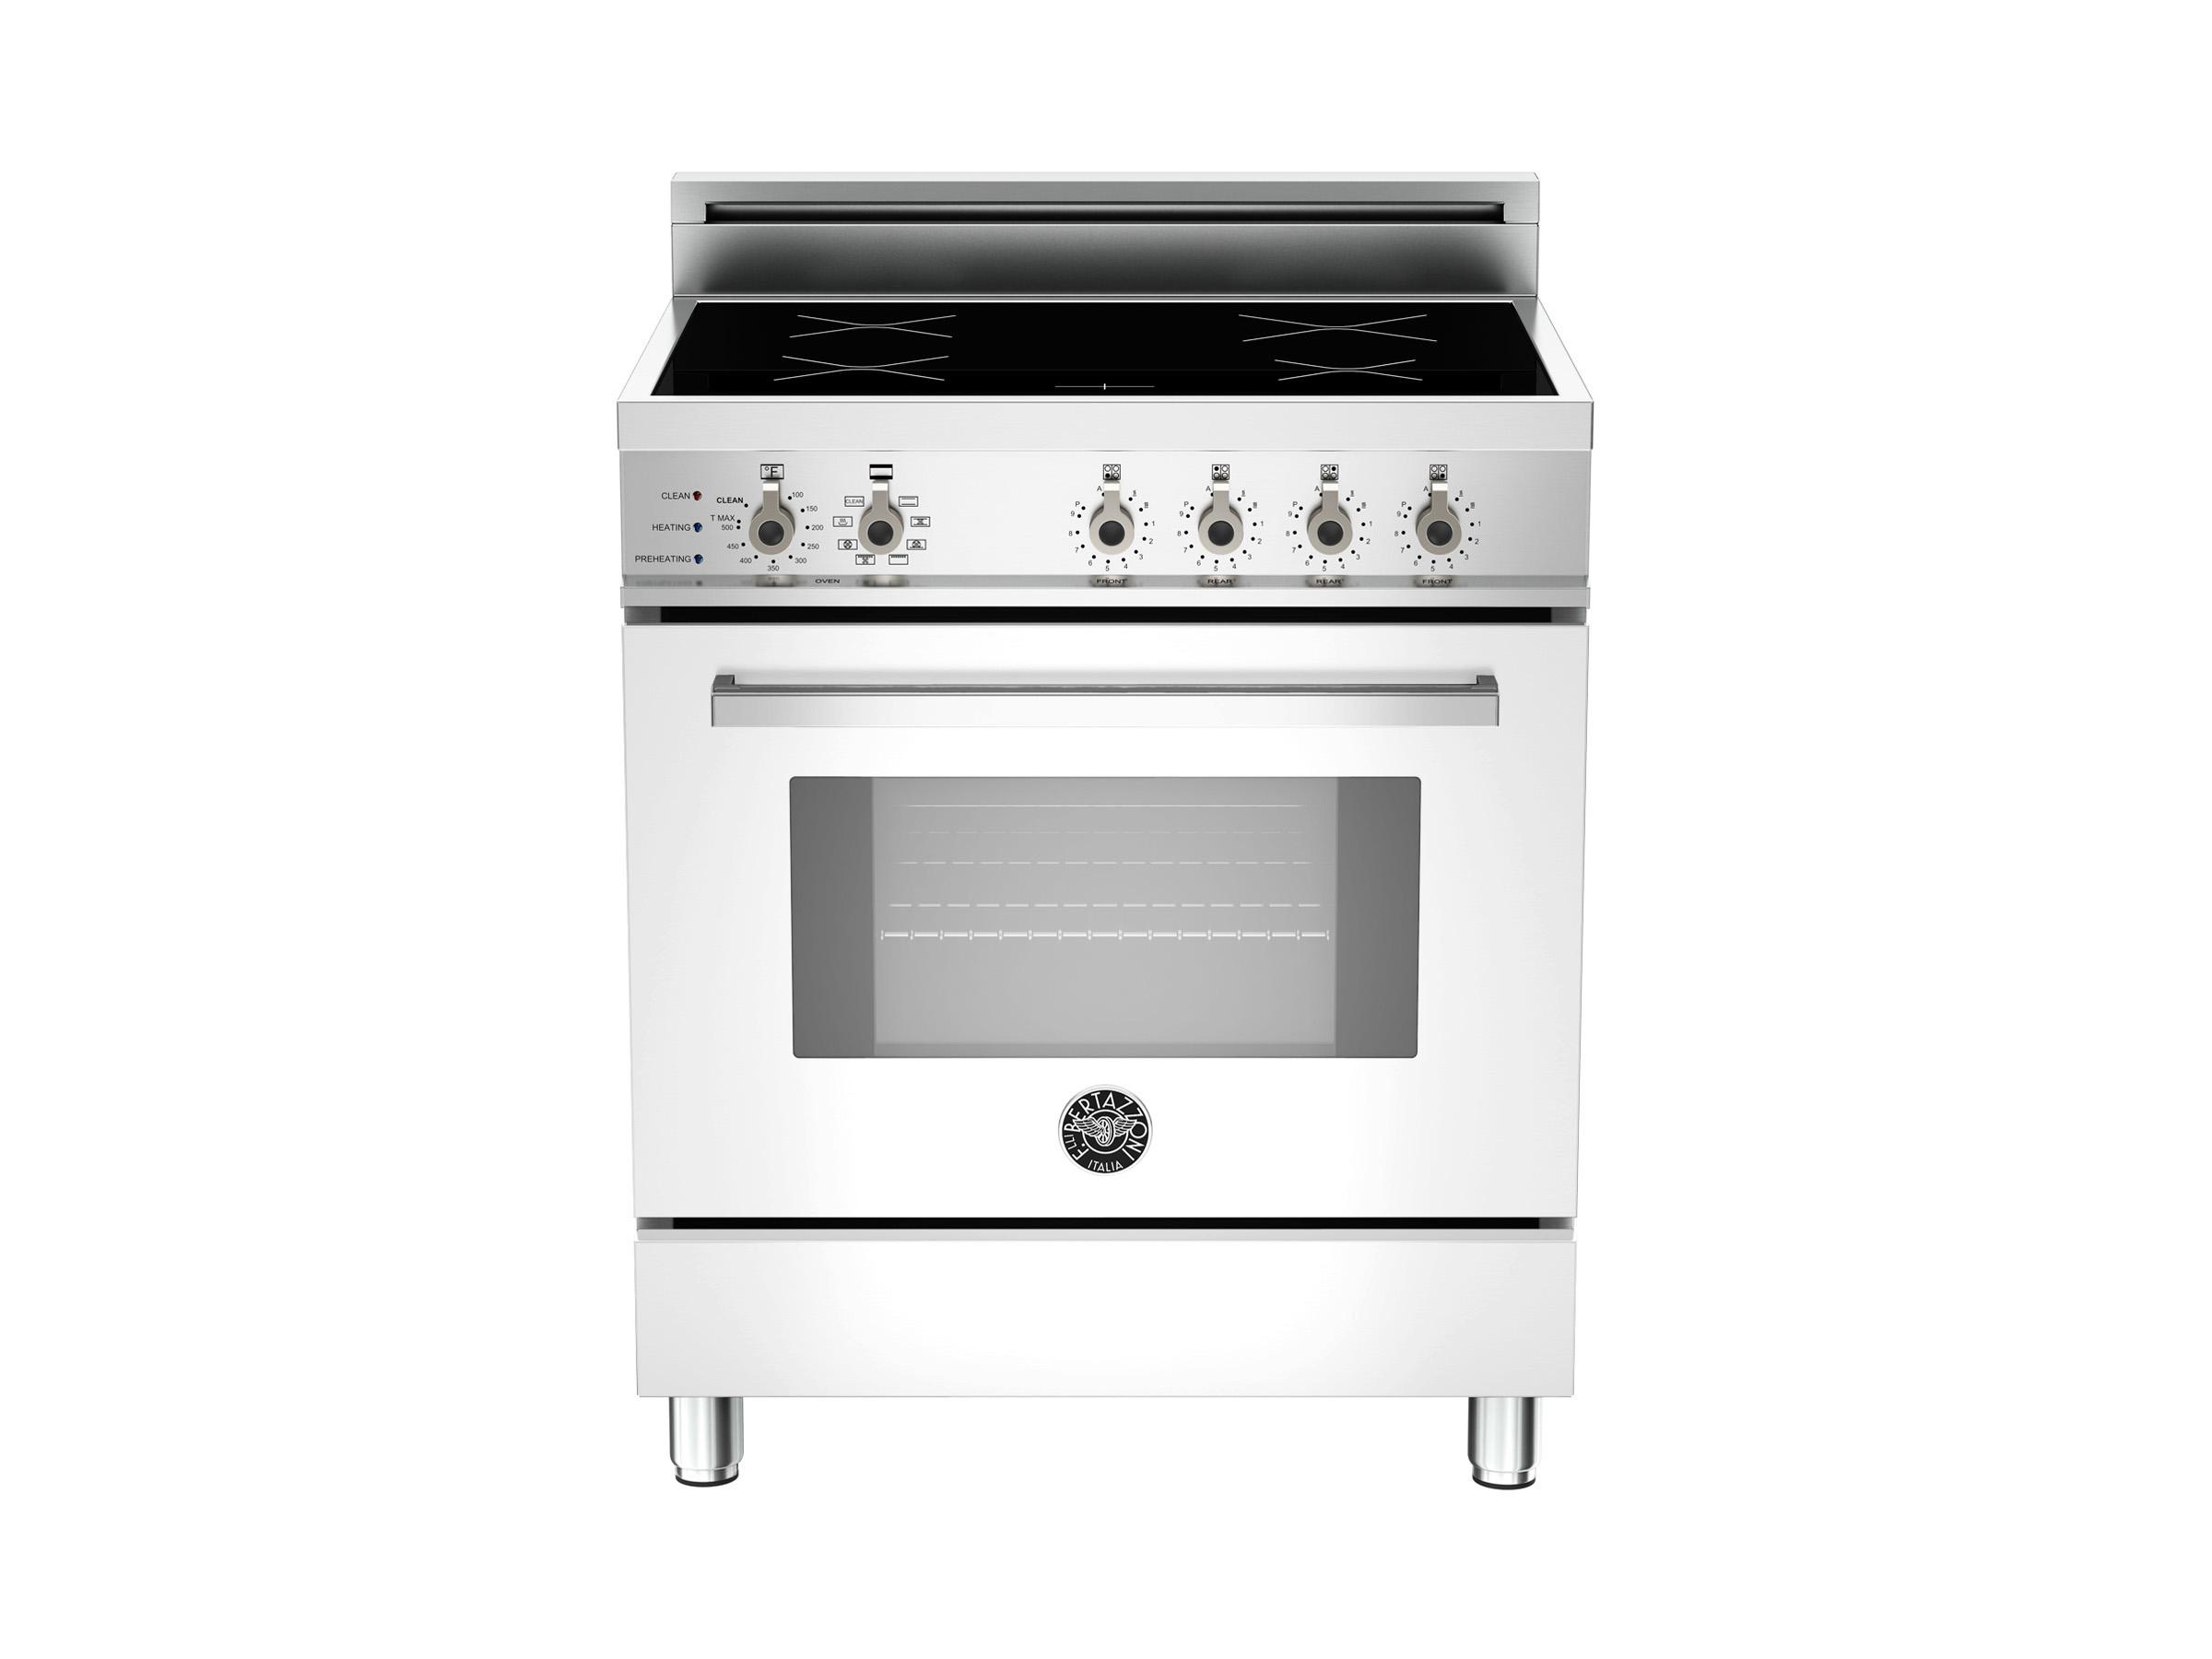 Top 5 Appliances Picks for 2016 | The Kitchenworks